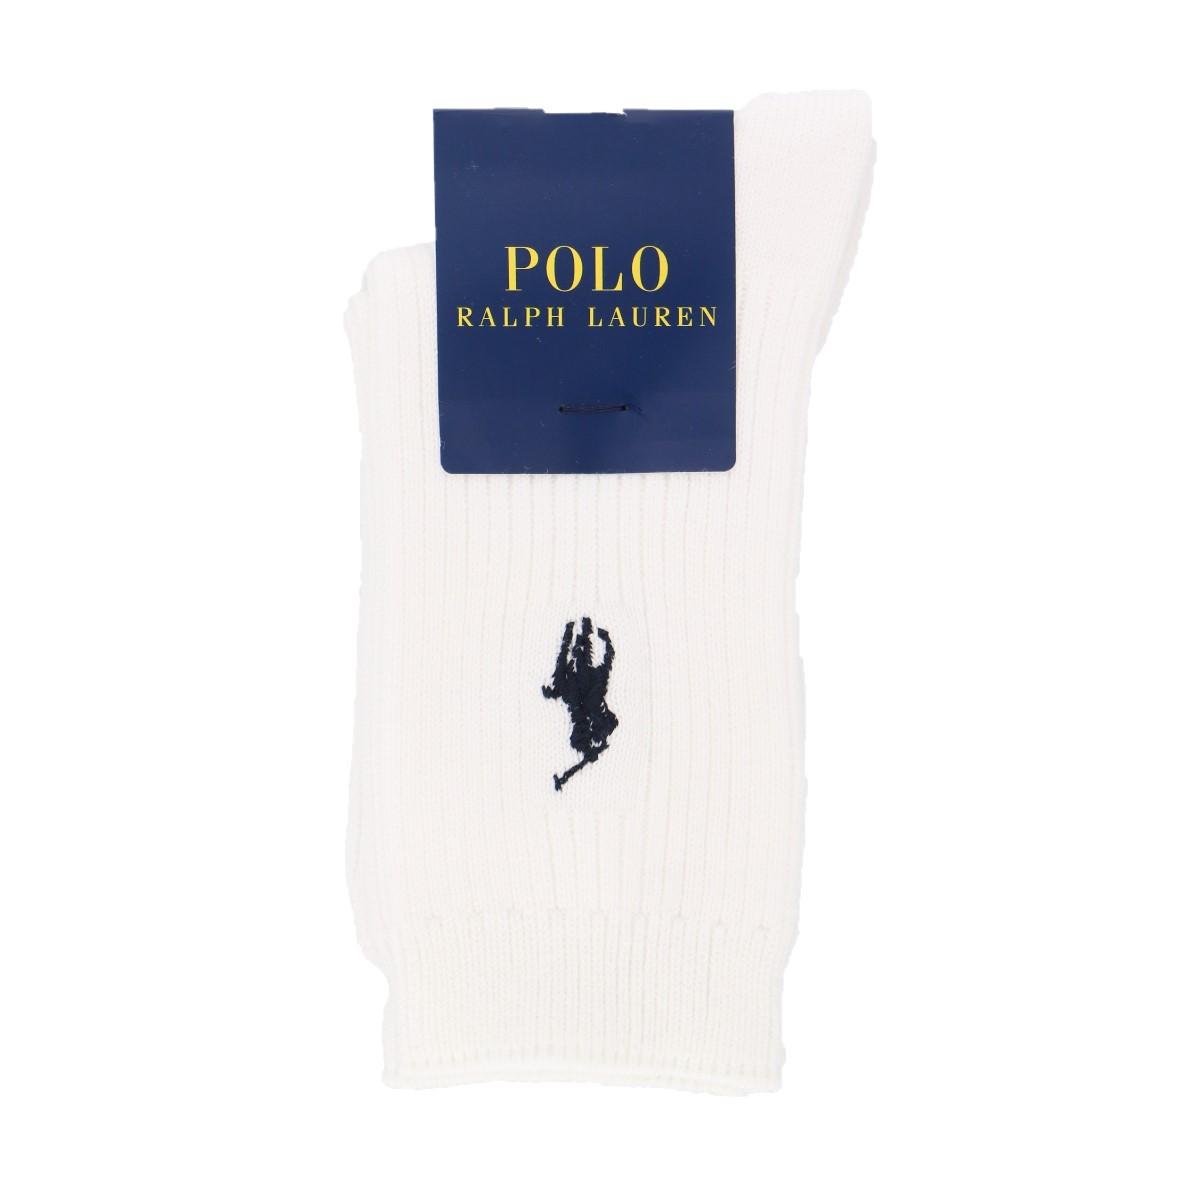 POLO RALPH LAUREN ポロ ラルフローレン|子供 男の子 女の子 キッズ ボーイズ ガールズ|ワンポイント刺繍 綿混|リブ クルーソックス|4865-426【ゆうパケット・4点まで】